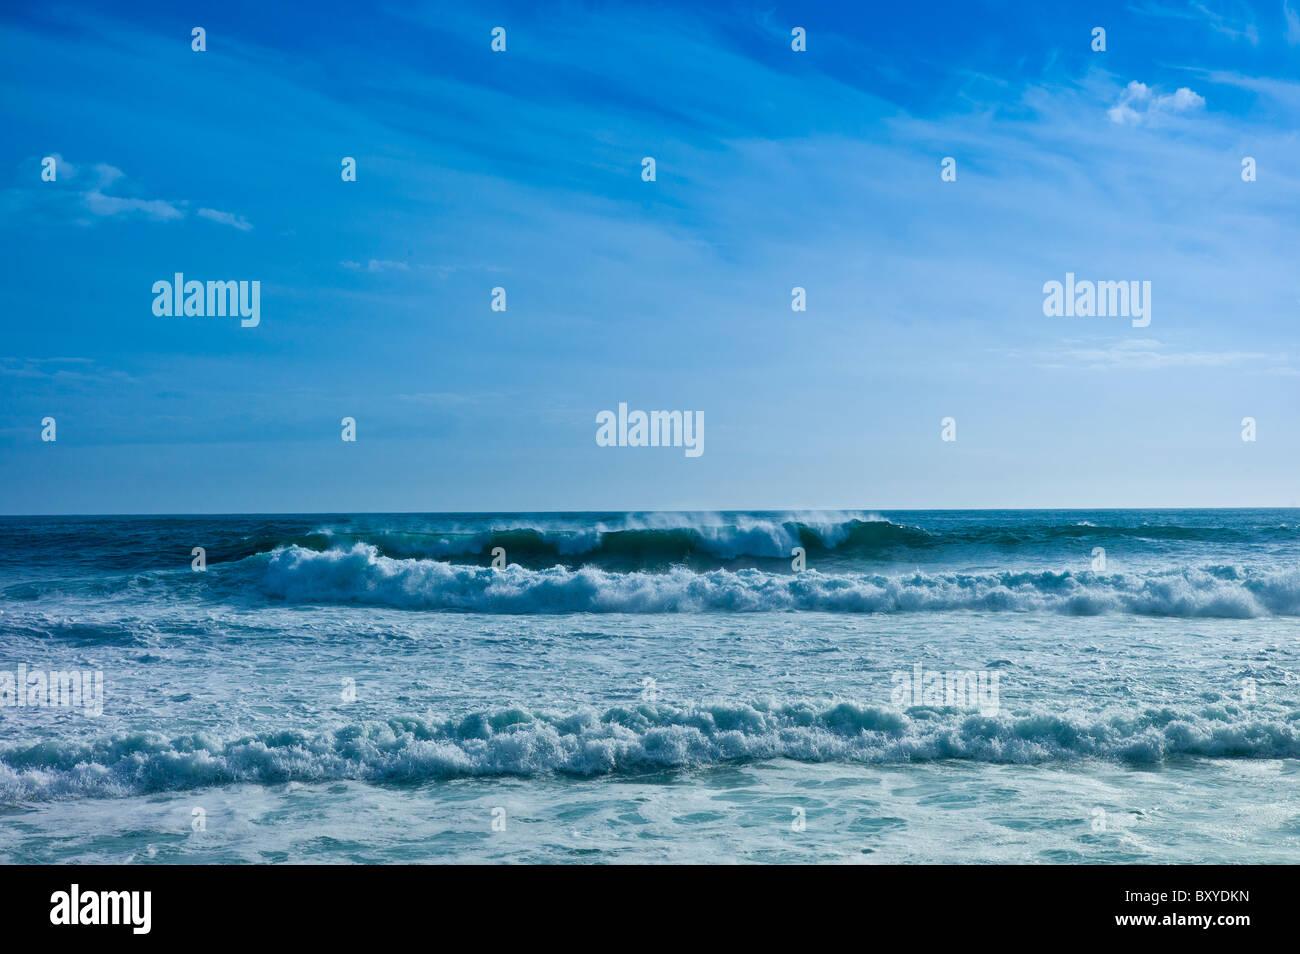 White horses waves off the coast of Doolin, County Clare, West Coast of Ireland - Stock Image